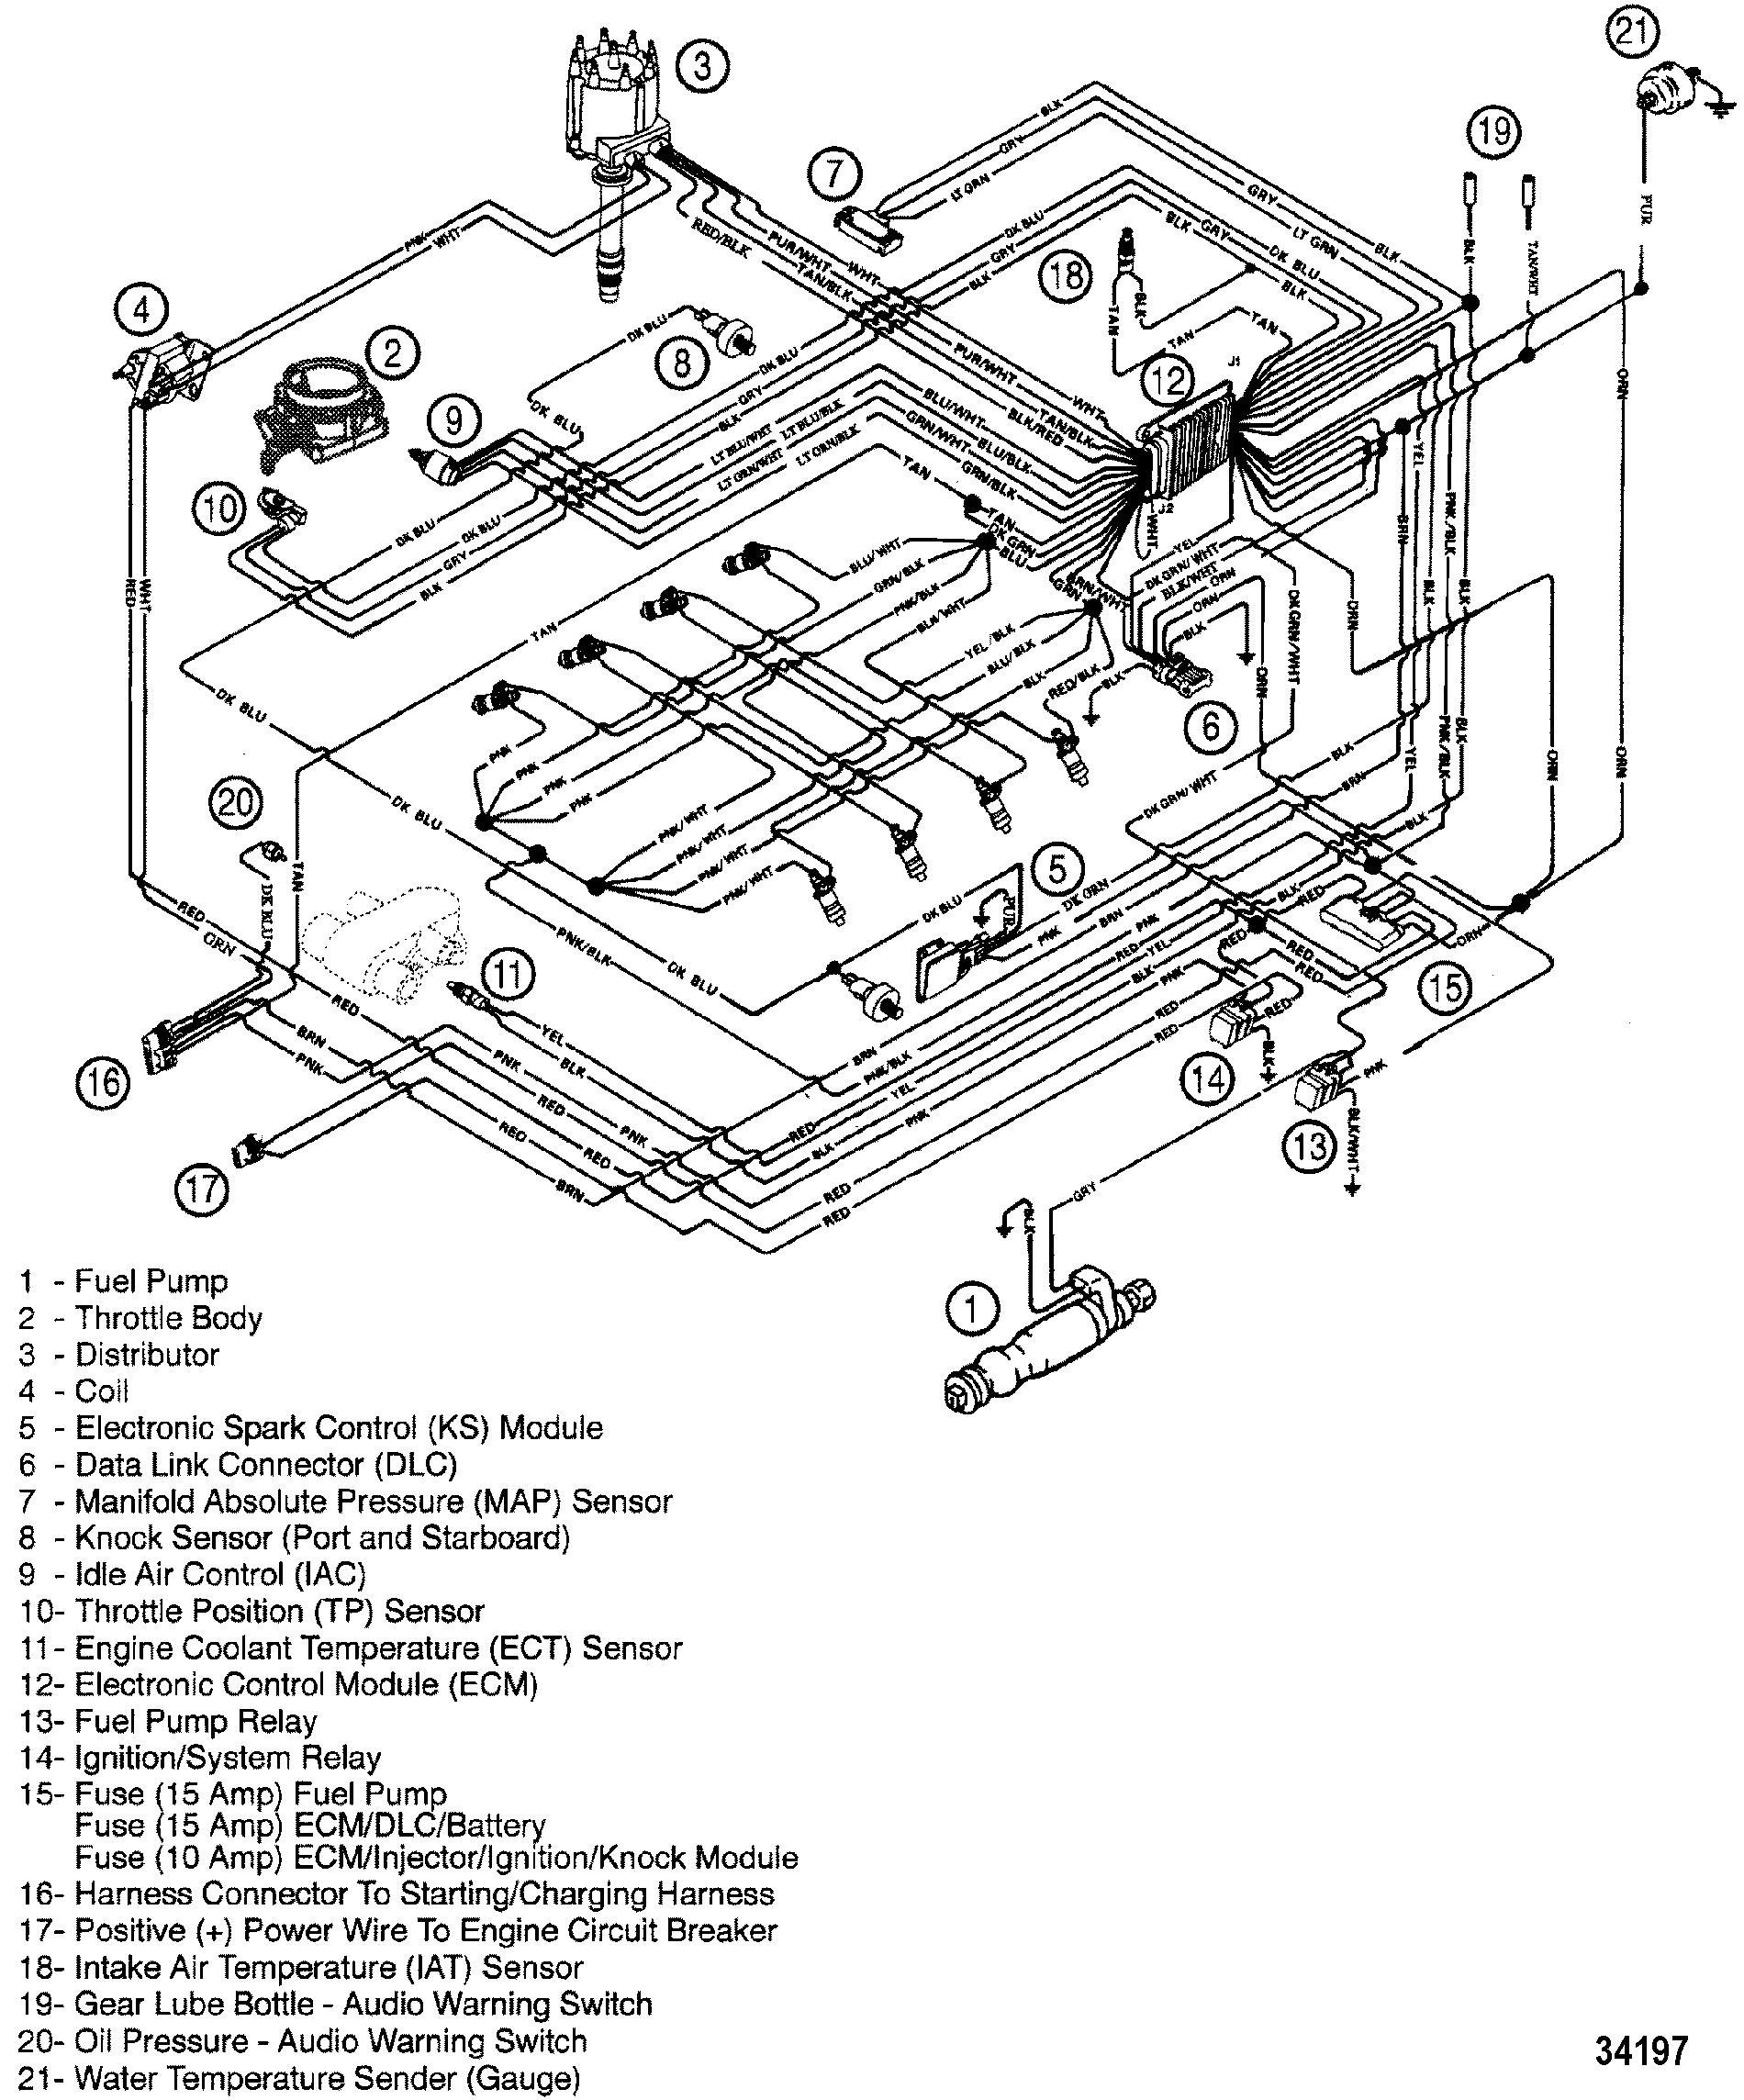 Mercruiser 7 4l Mpi Mie L29